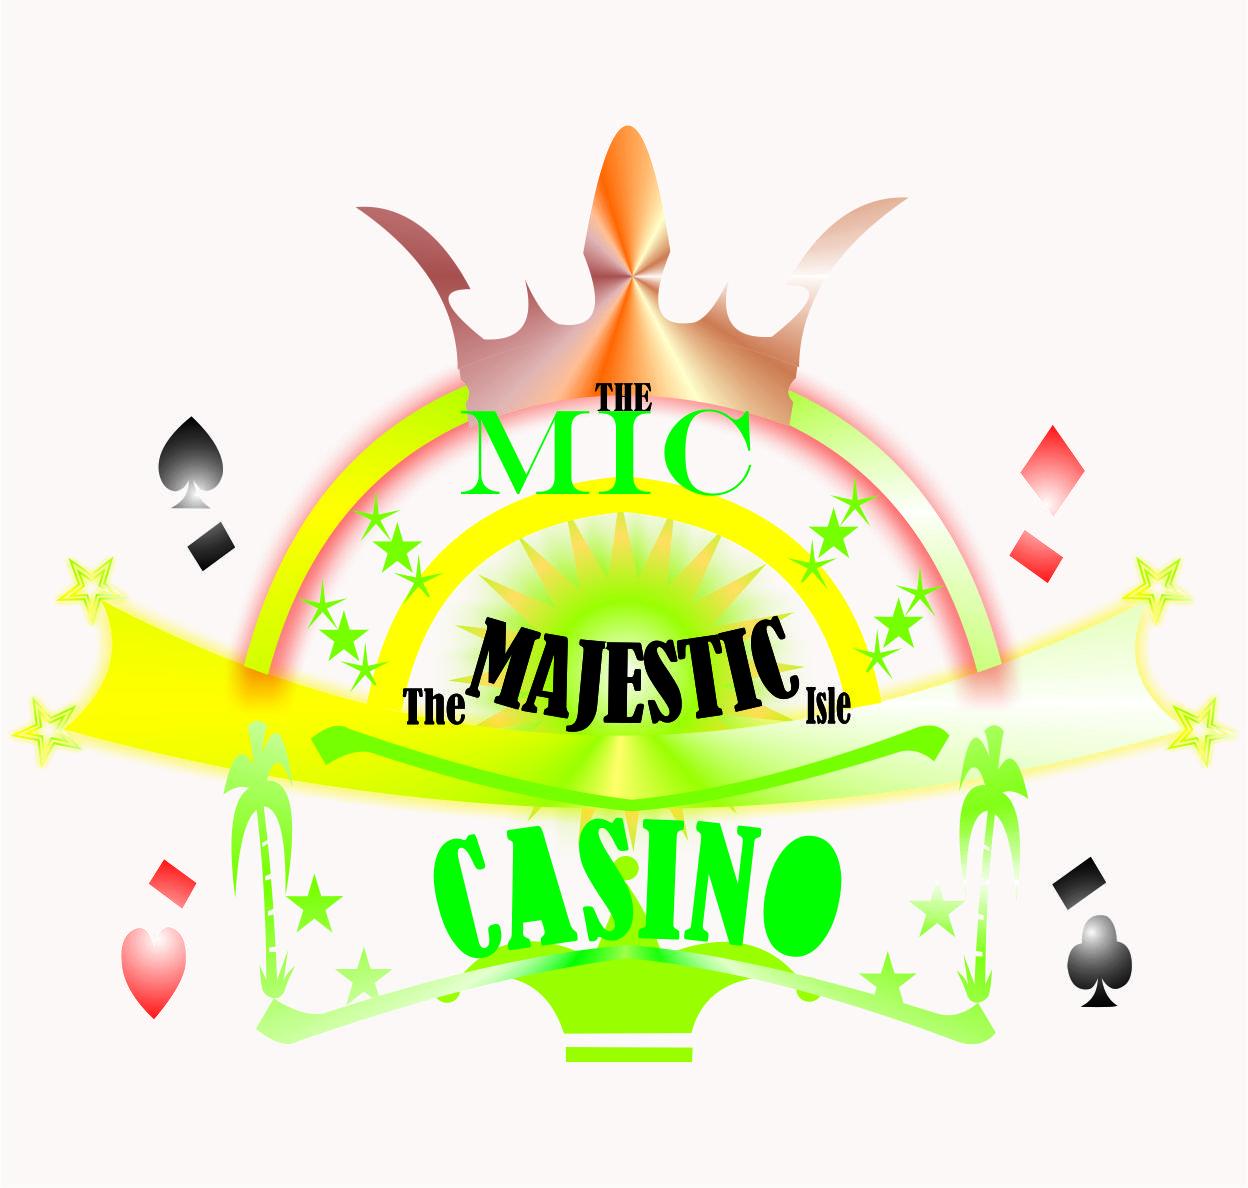 Logo Design by Teguh Hanuraga - Entry No. 47 in the Logo Design Contest New Logo Design for The Majestic Isle Casino.